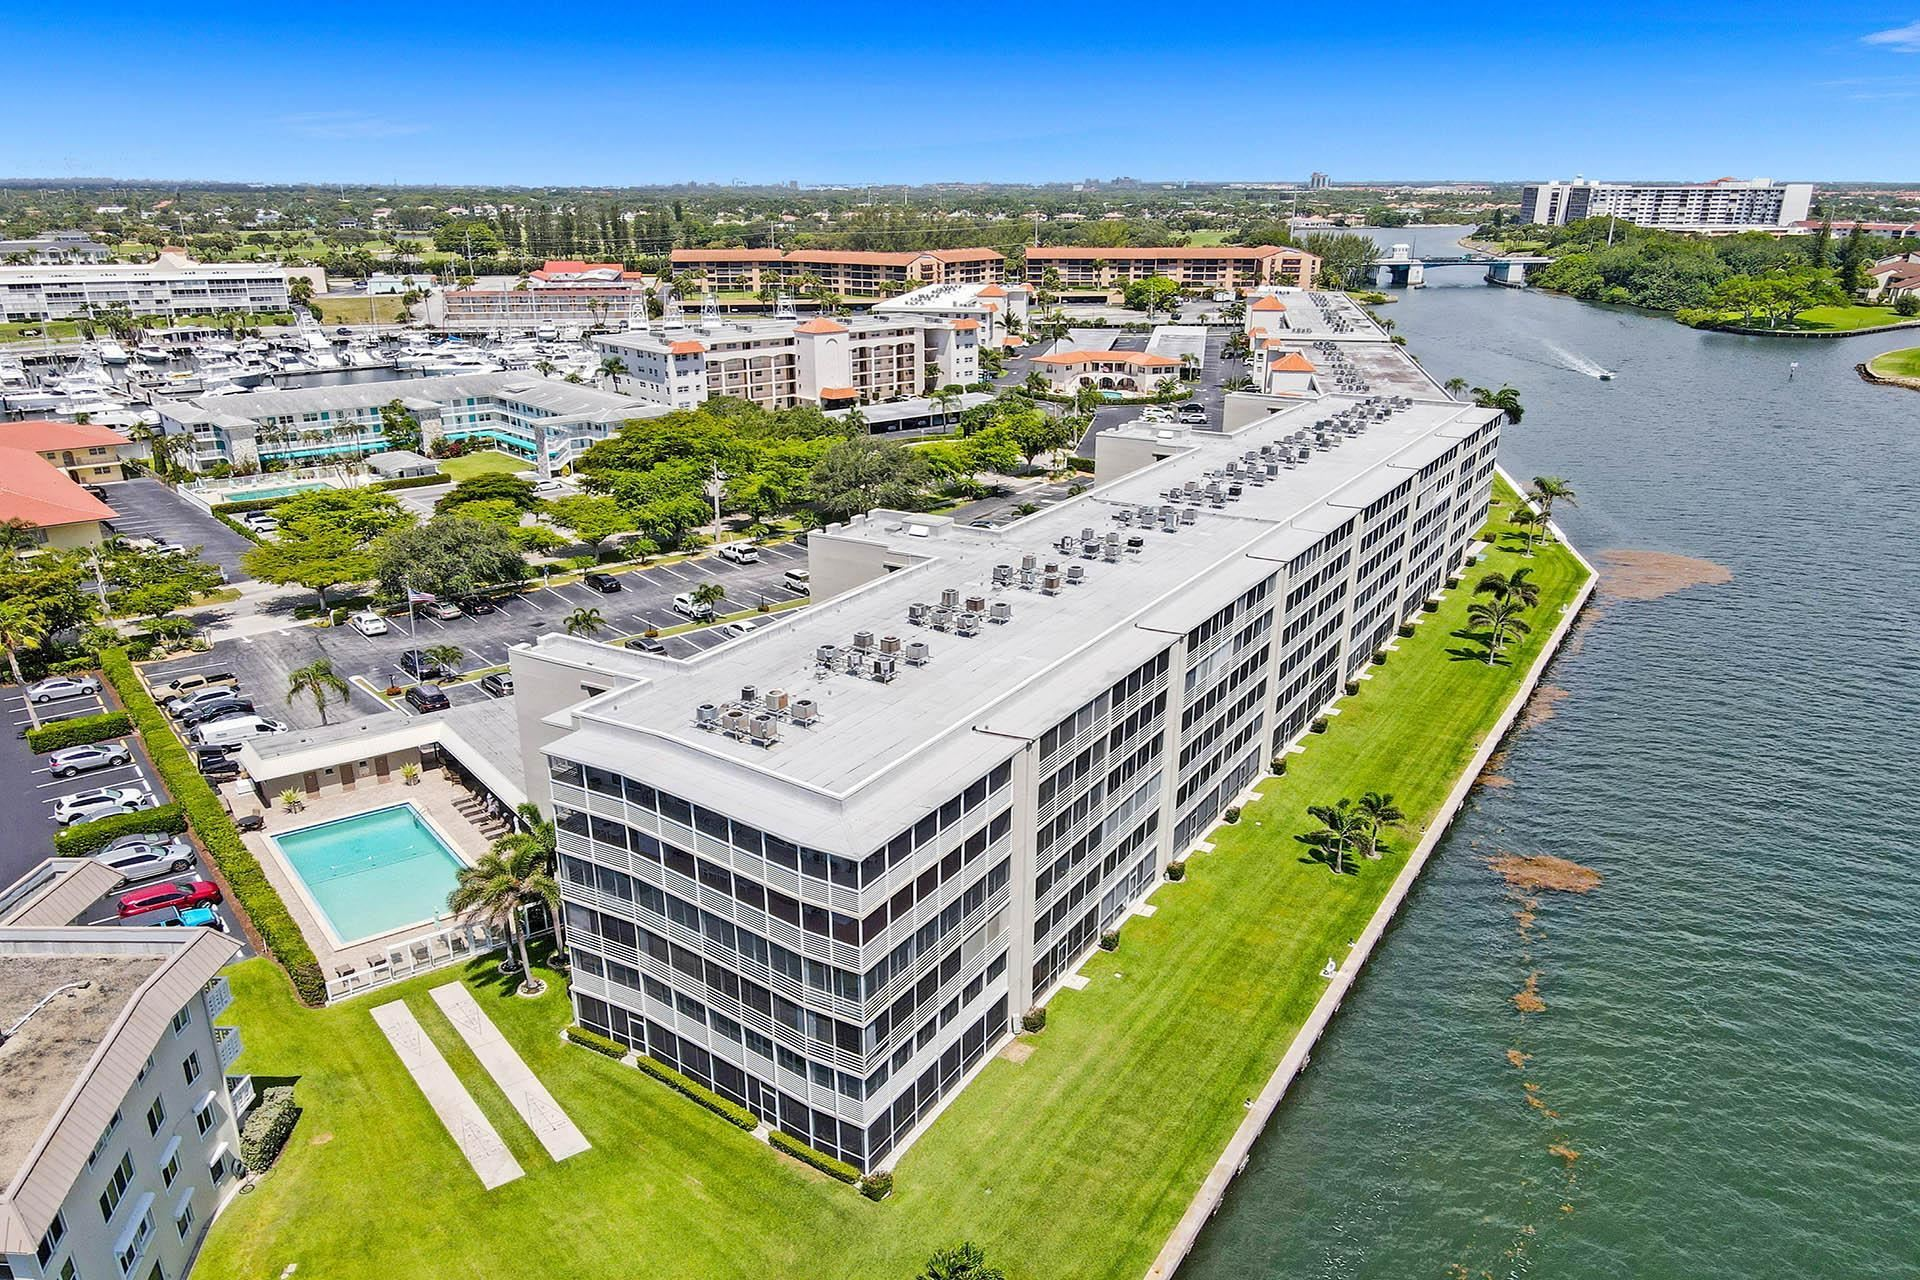 44 Yacht Club Drive #314, North Palm Beach, FL 33408 - MLS#: RX-10724081